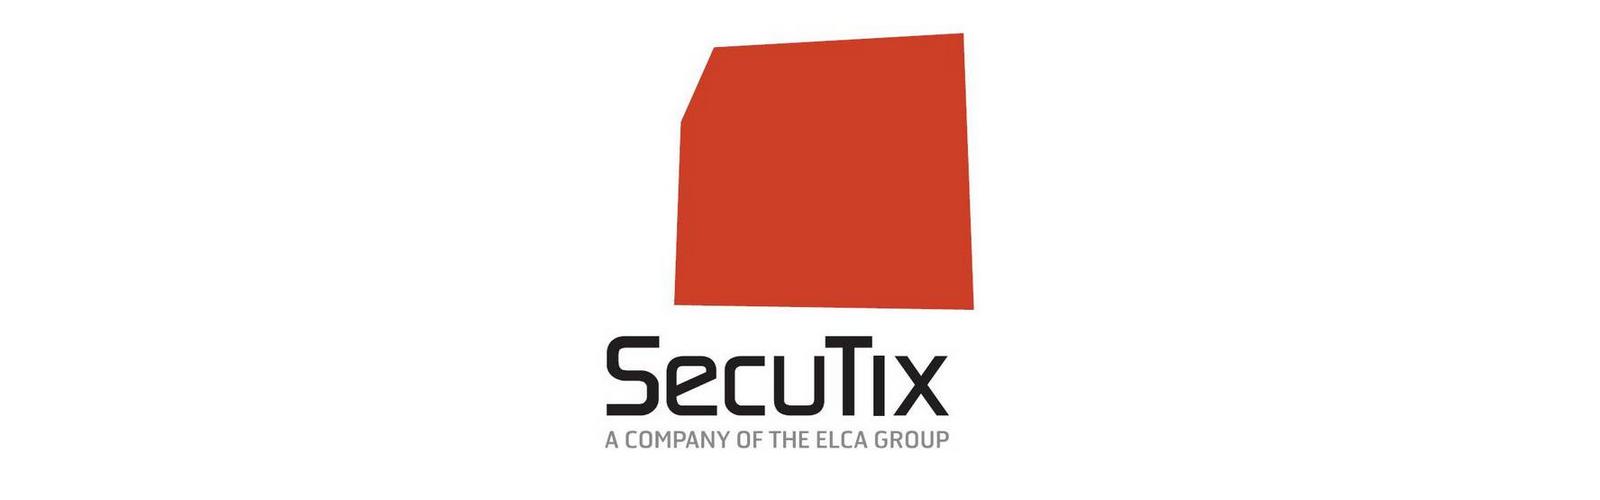 secutix-logo-ban